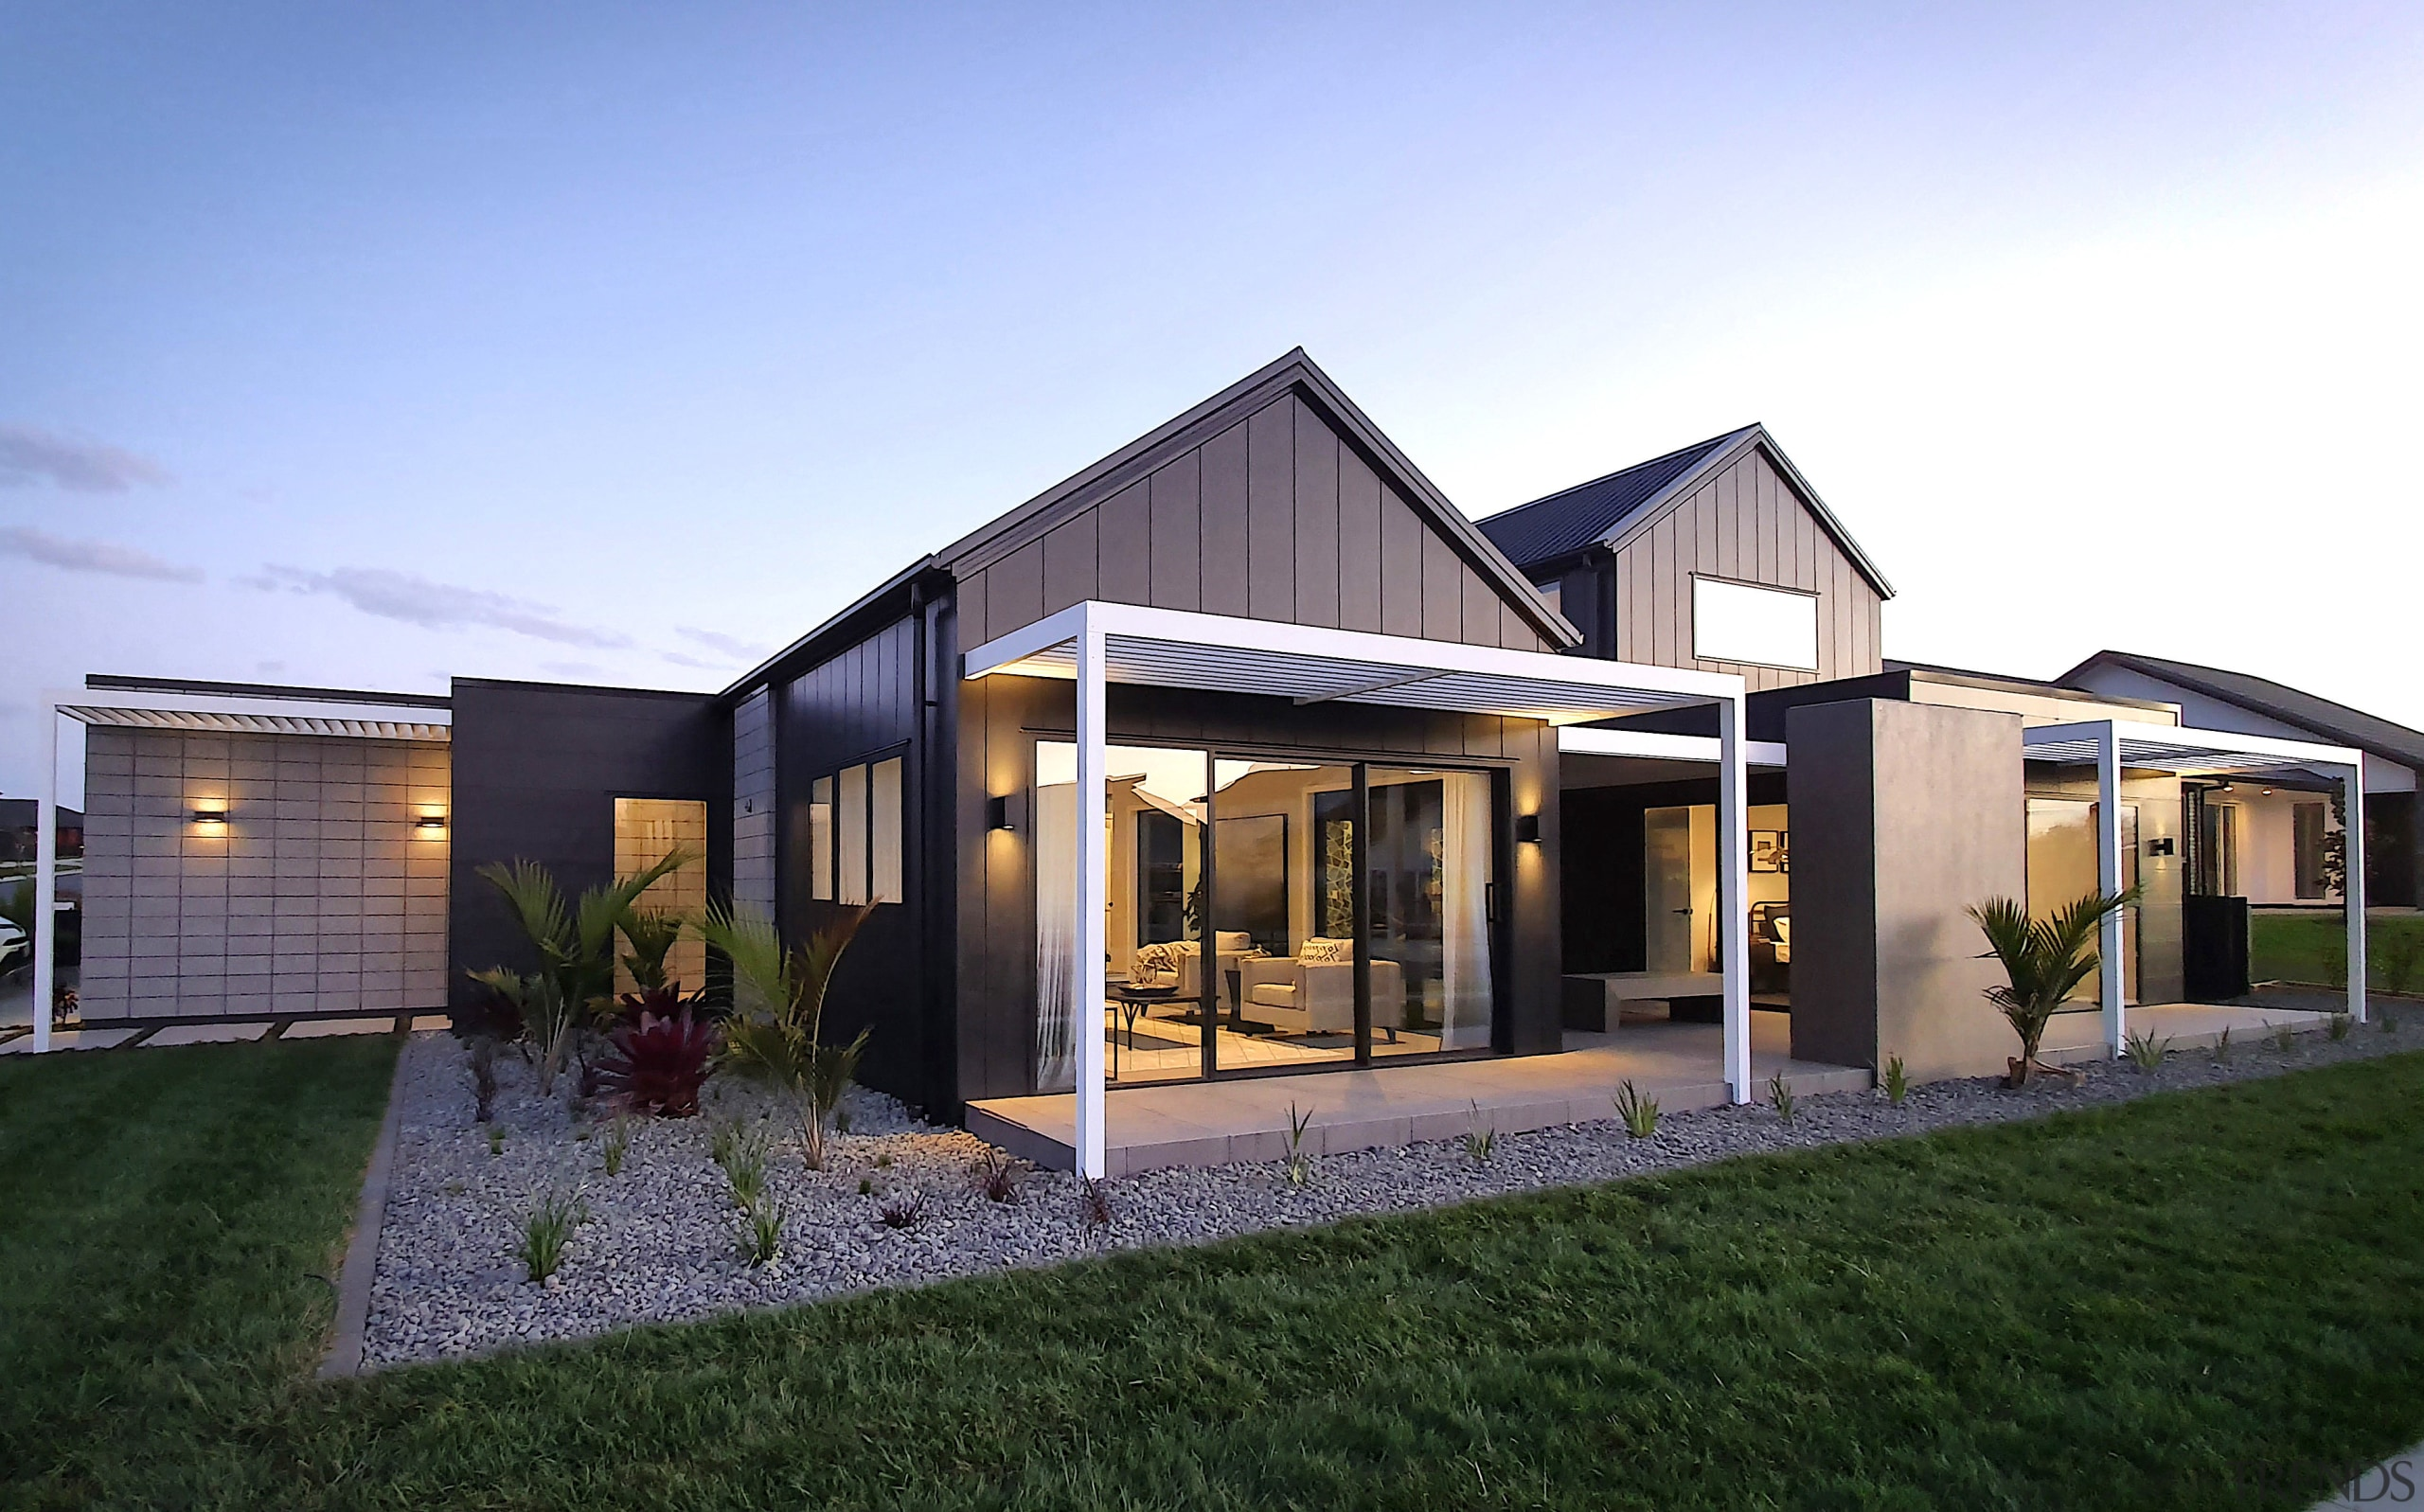 Metallic paints, concrete effect paints and on-trend wallpaper